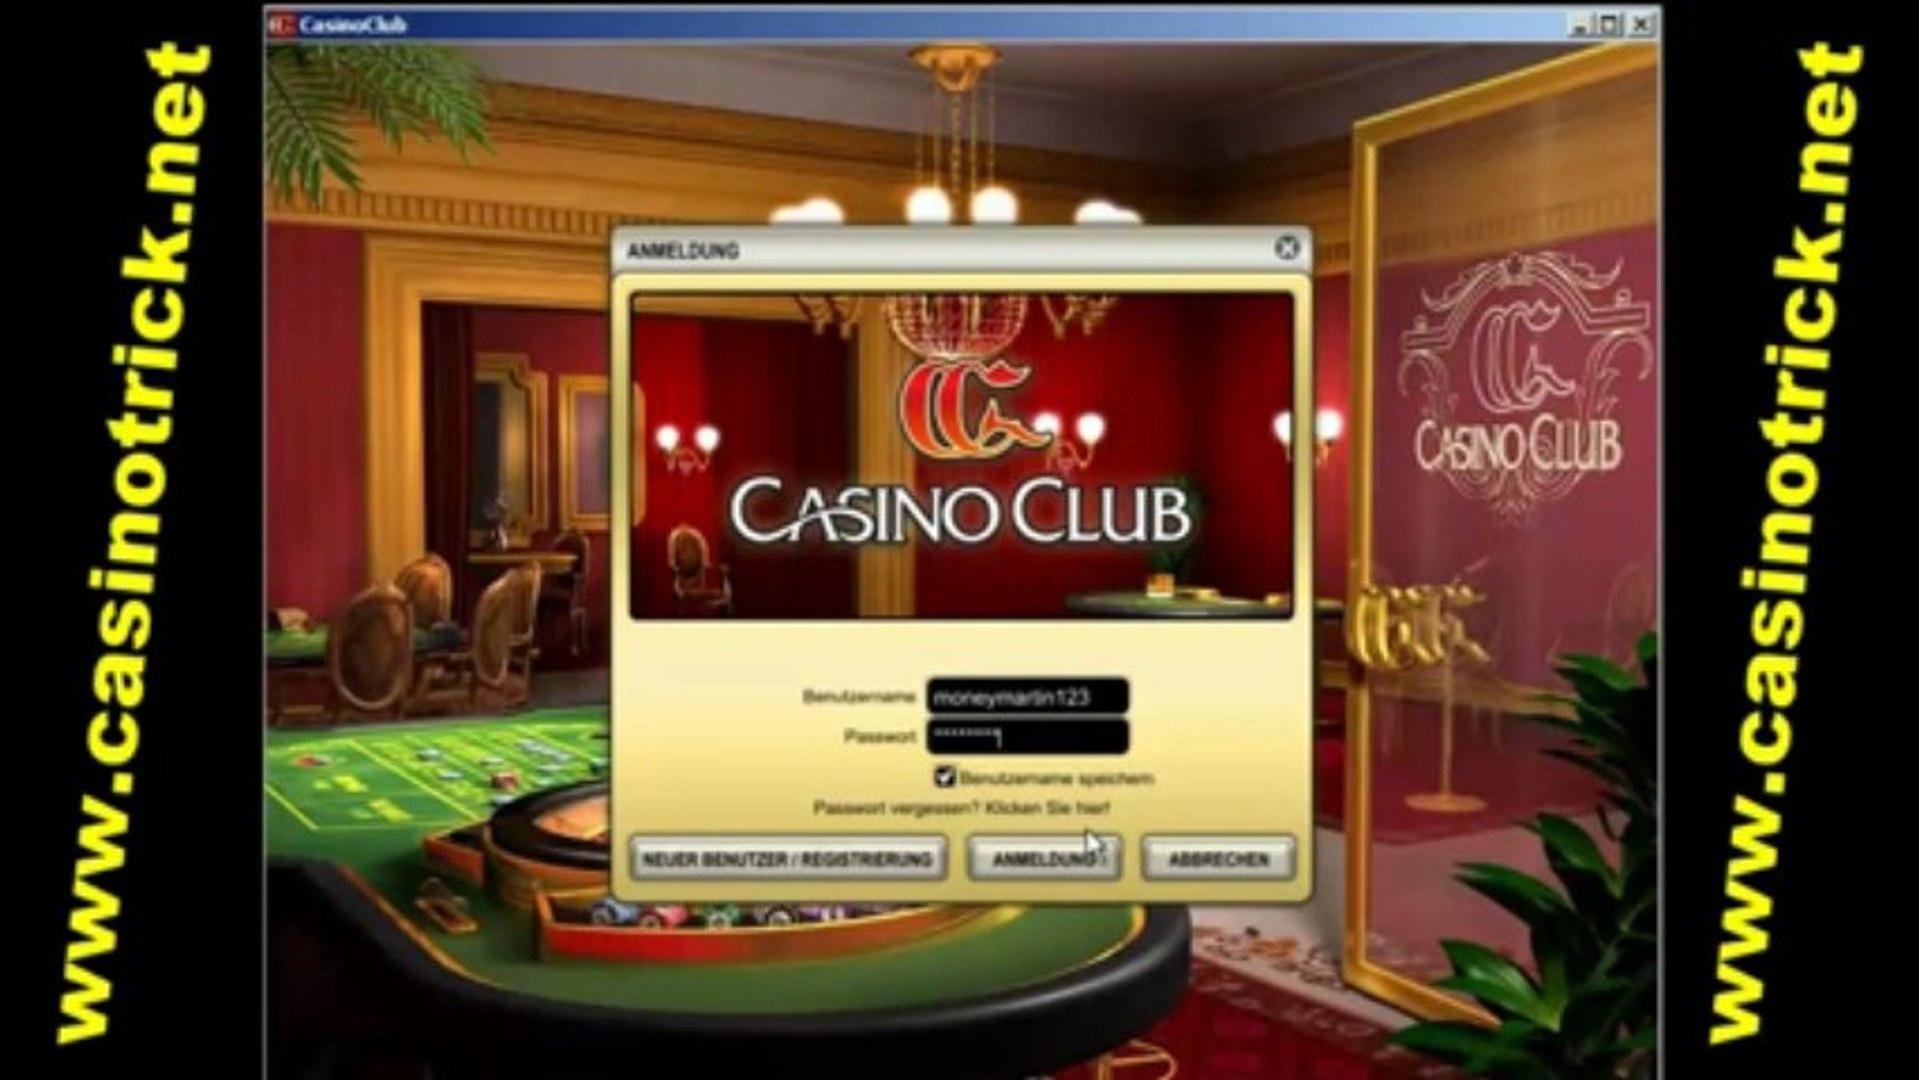 Online Casino Strategie - Casino Tricks